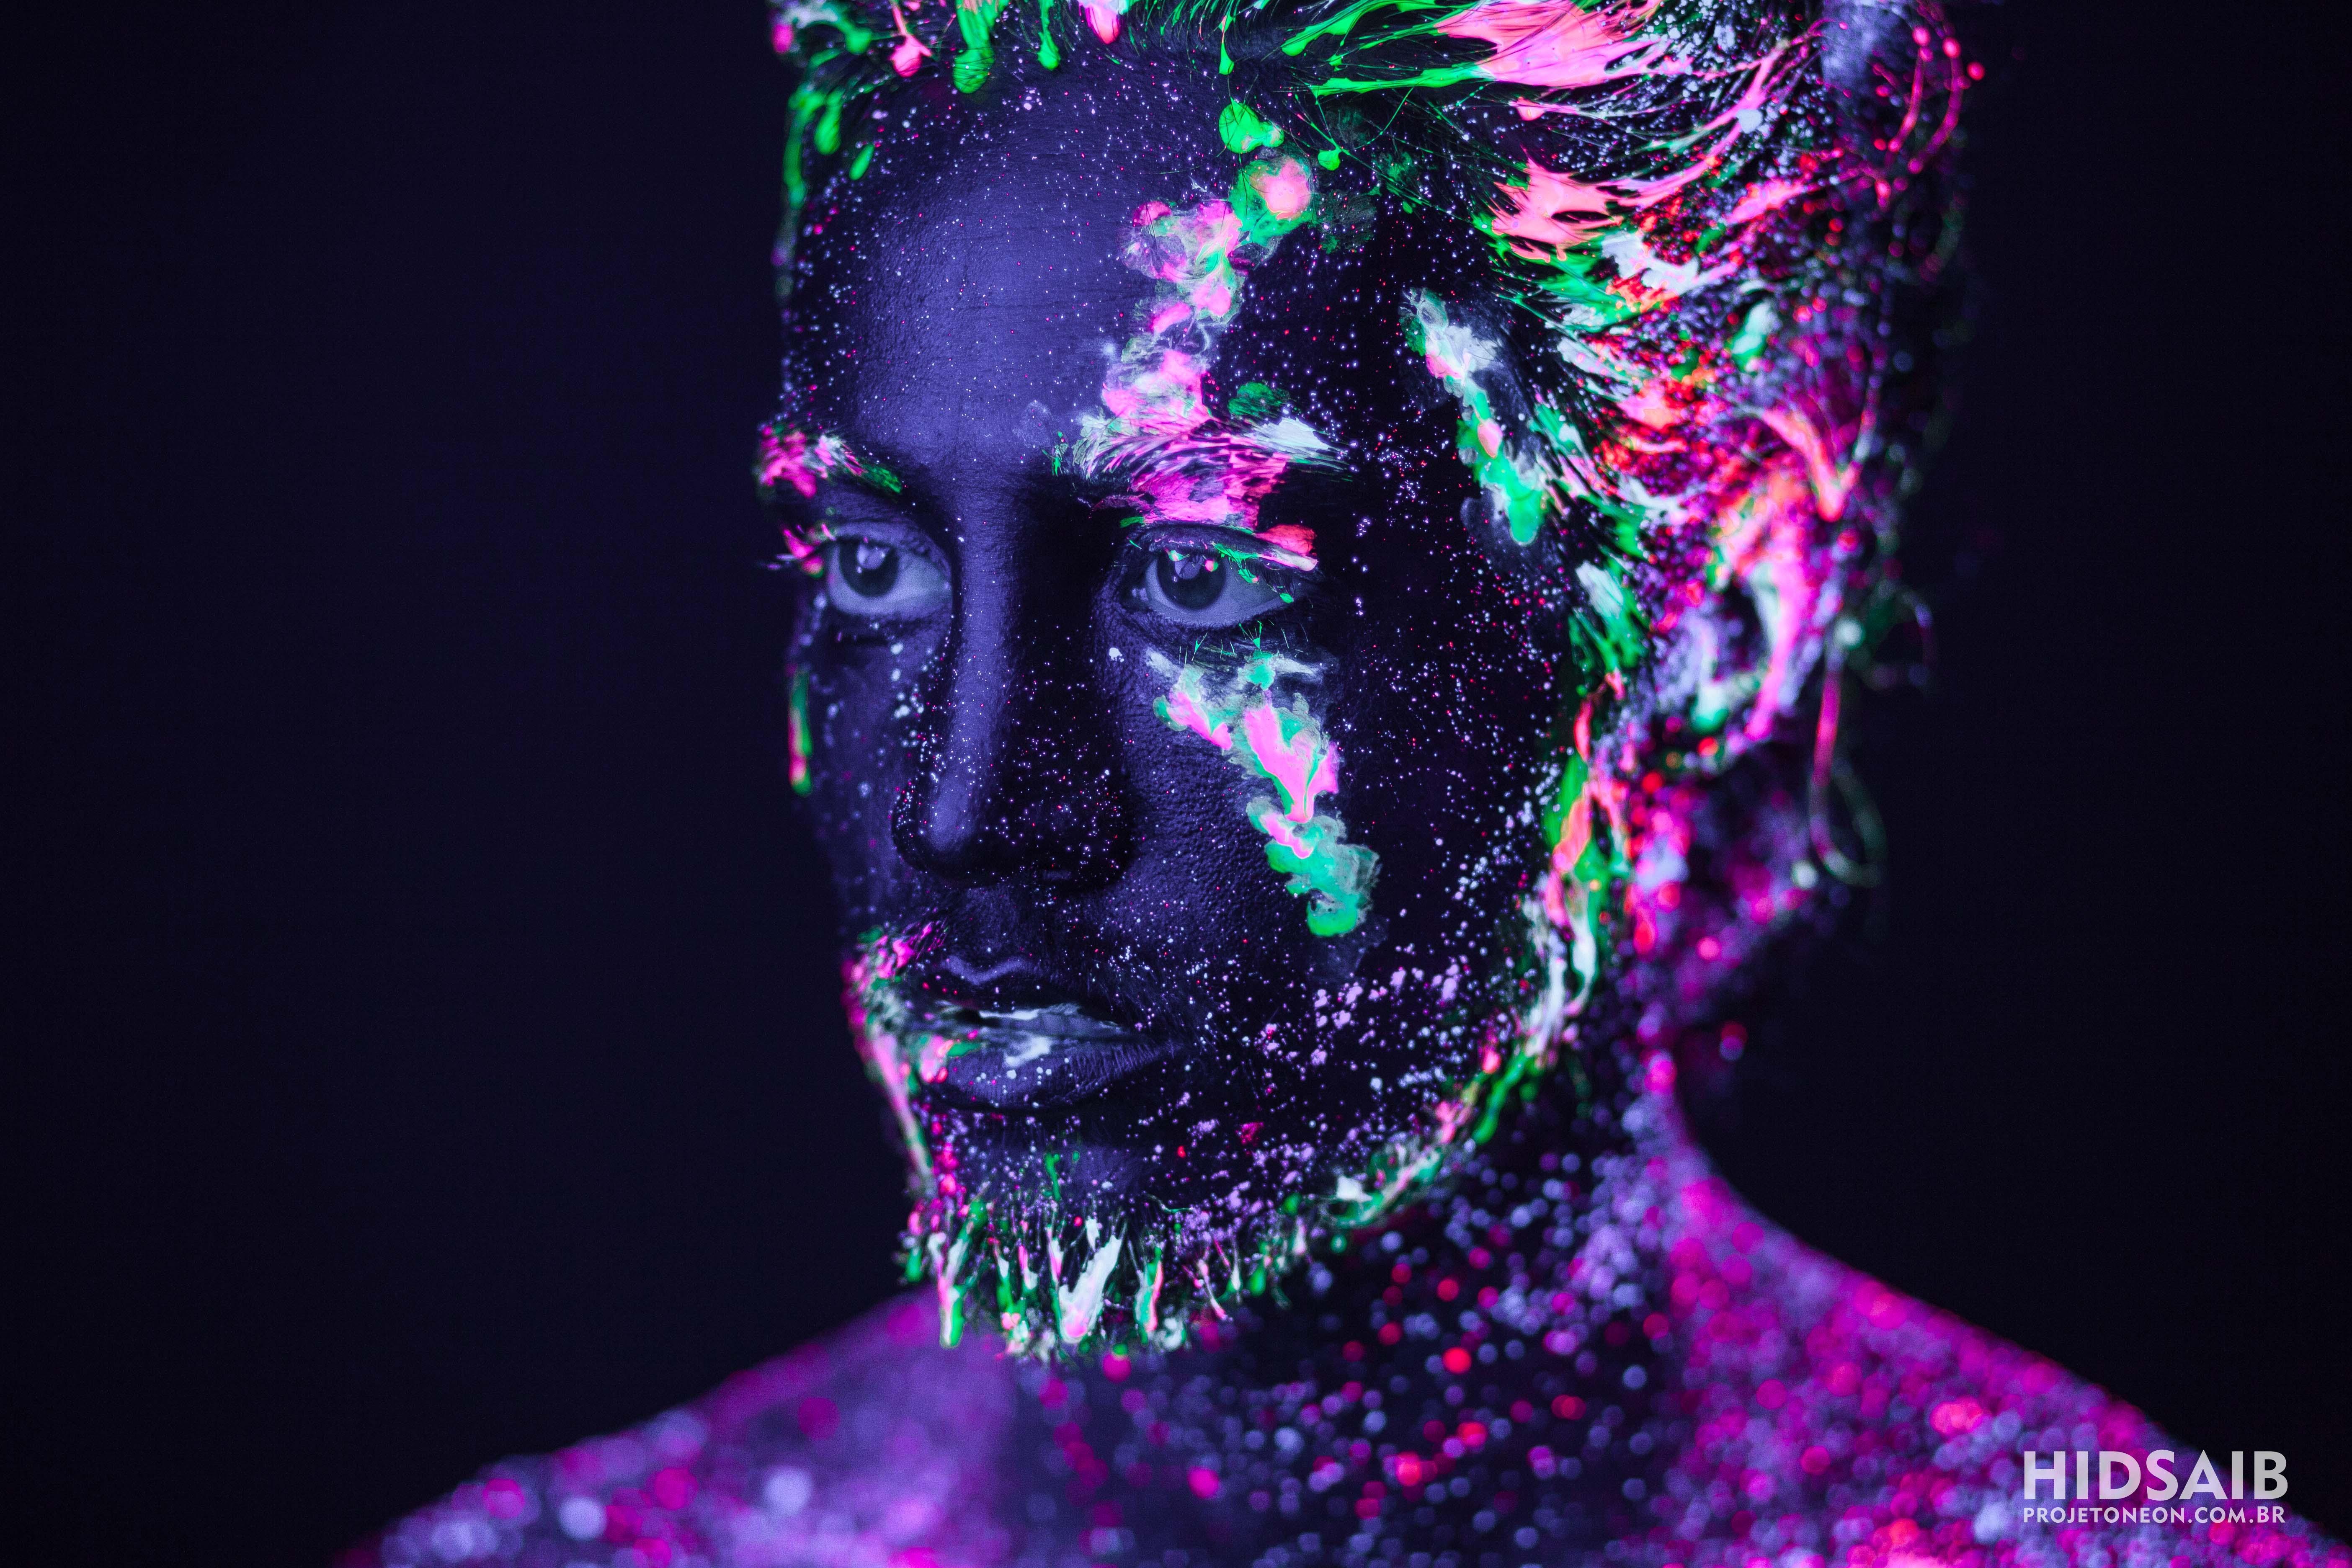 Tiago Iorc em neon por Hid Saib